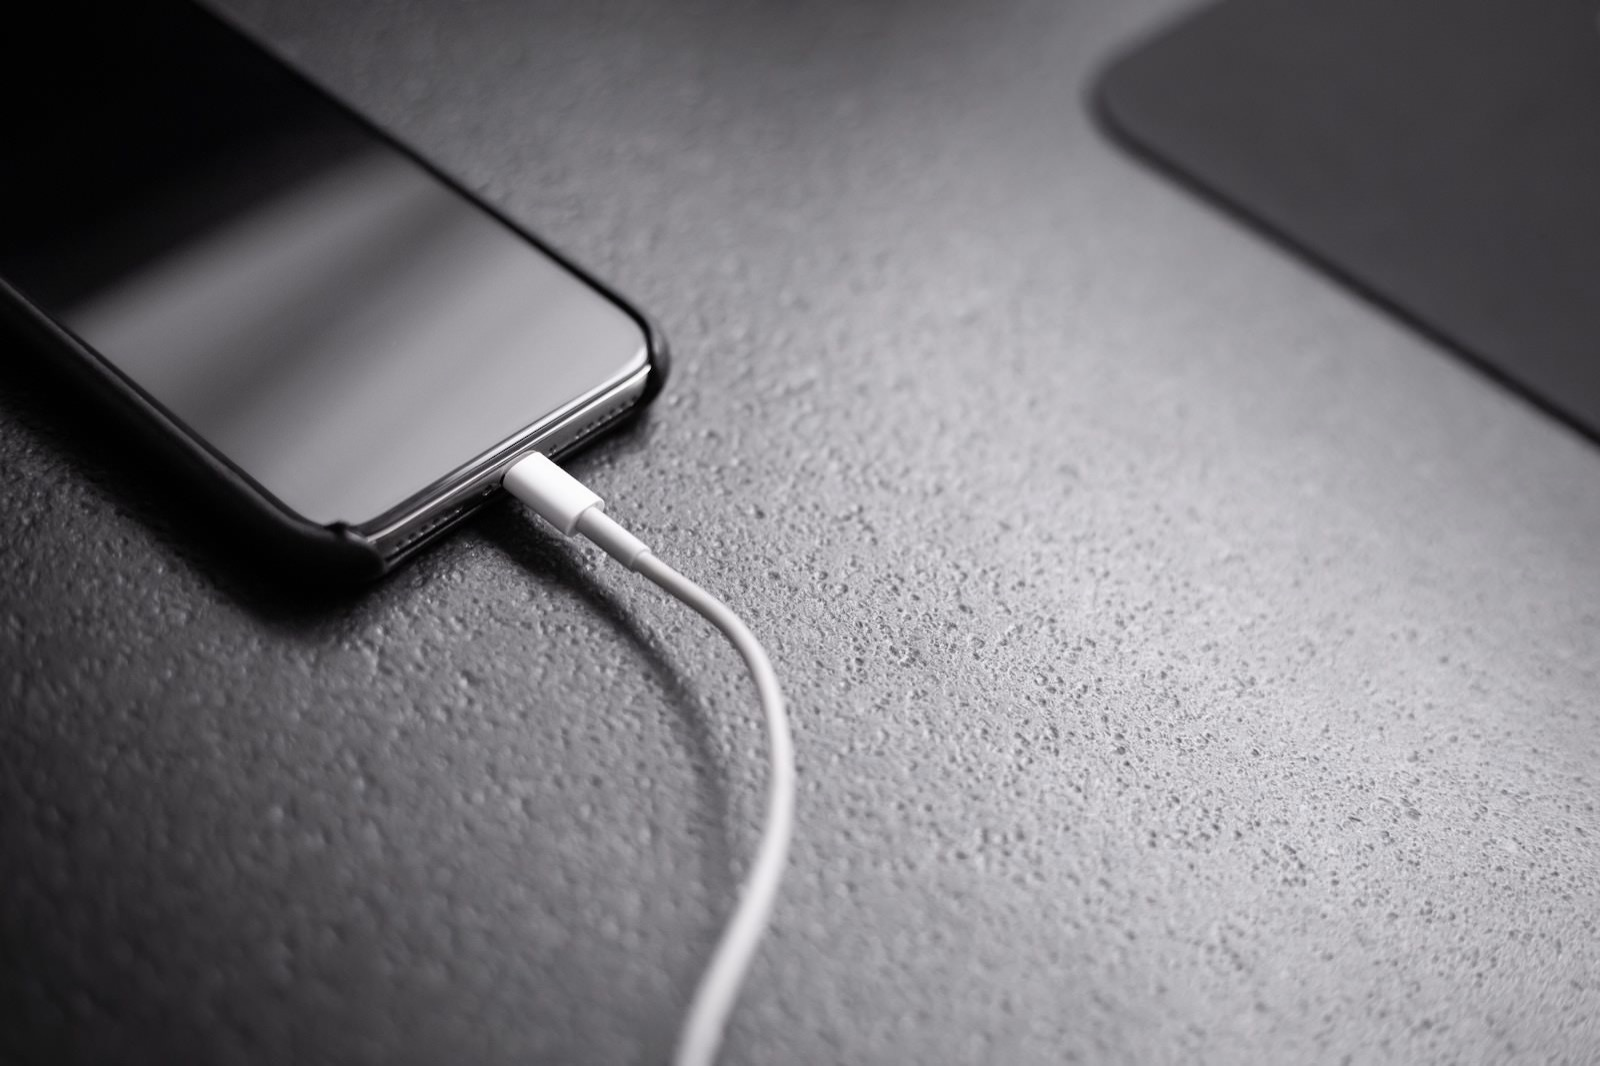 andreas-haslinger-1589200-unsplash-charging-iphone.jpg